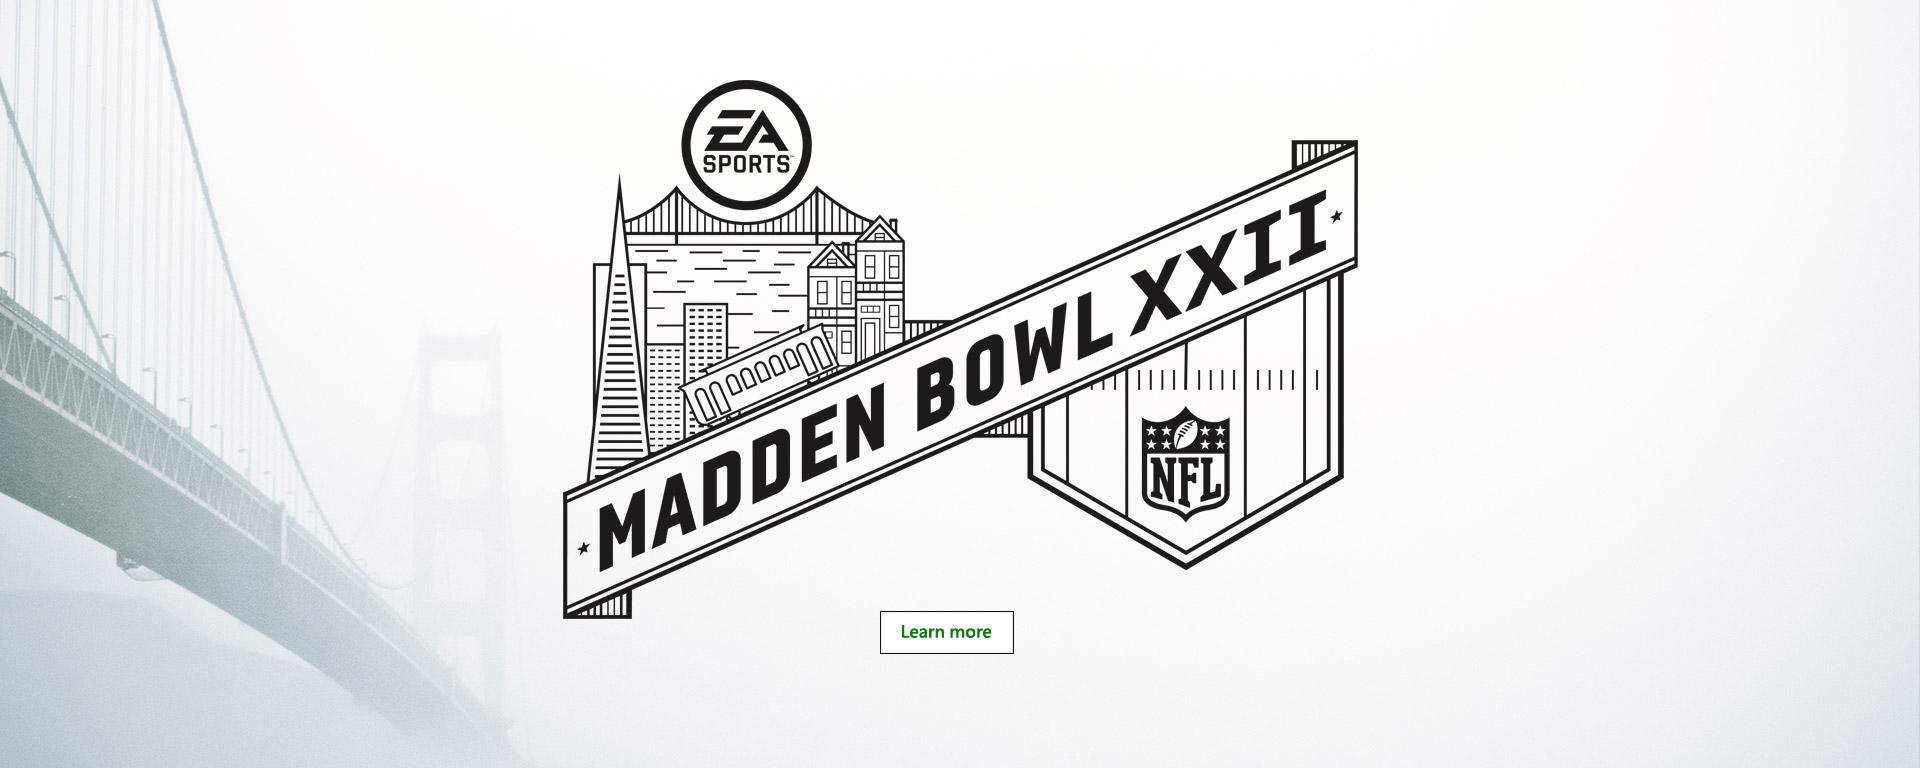 madden 16 bowl